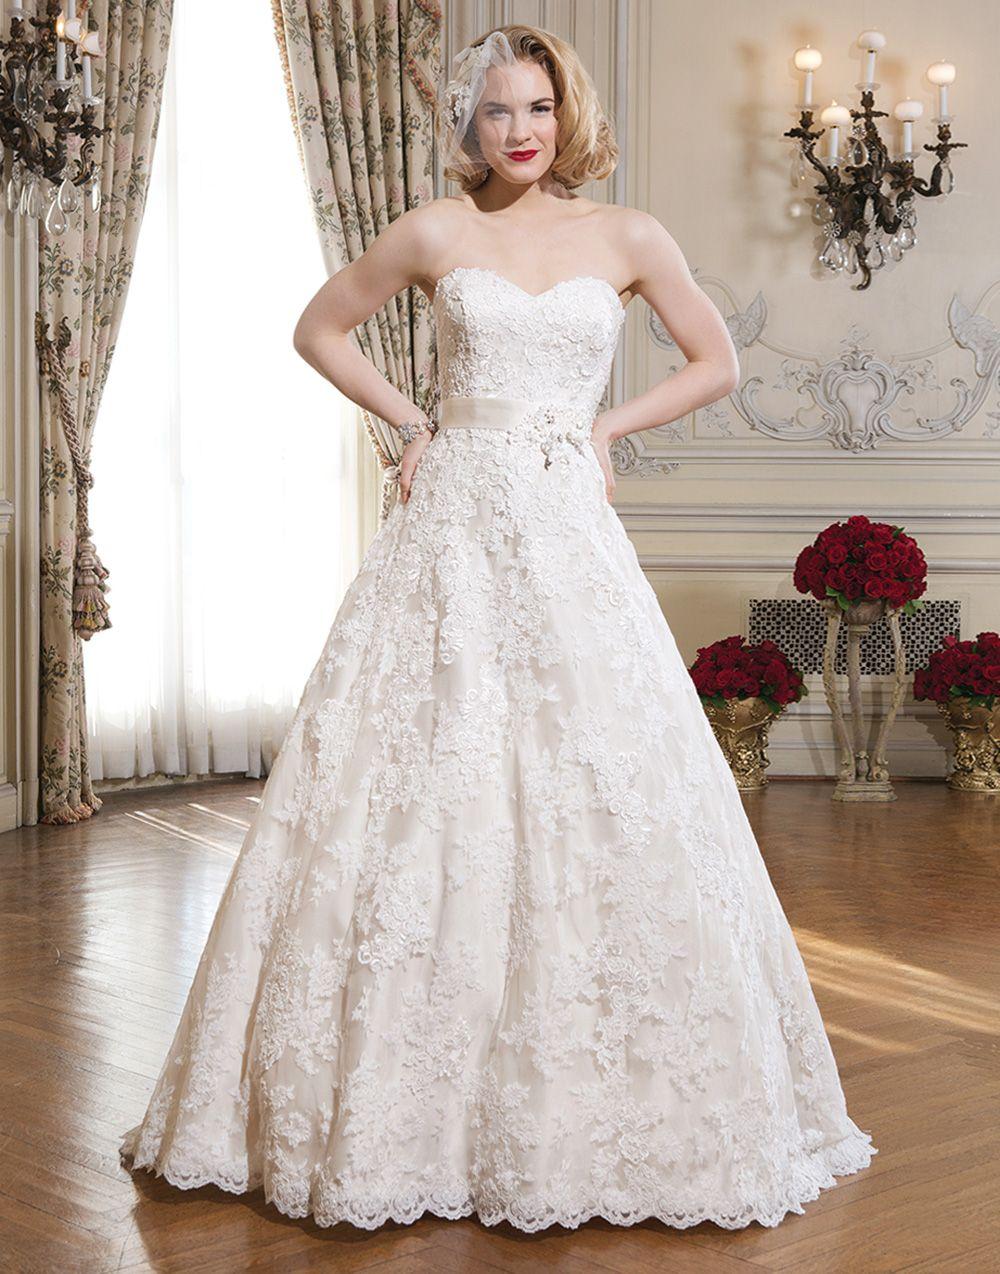 Justin alexander wedding dresses style venice lace full aline